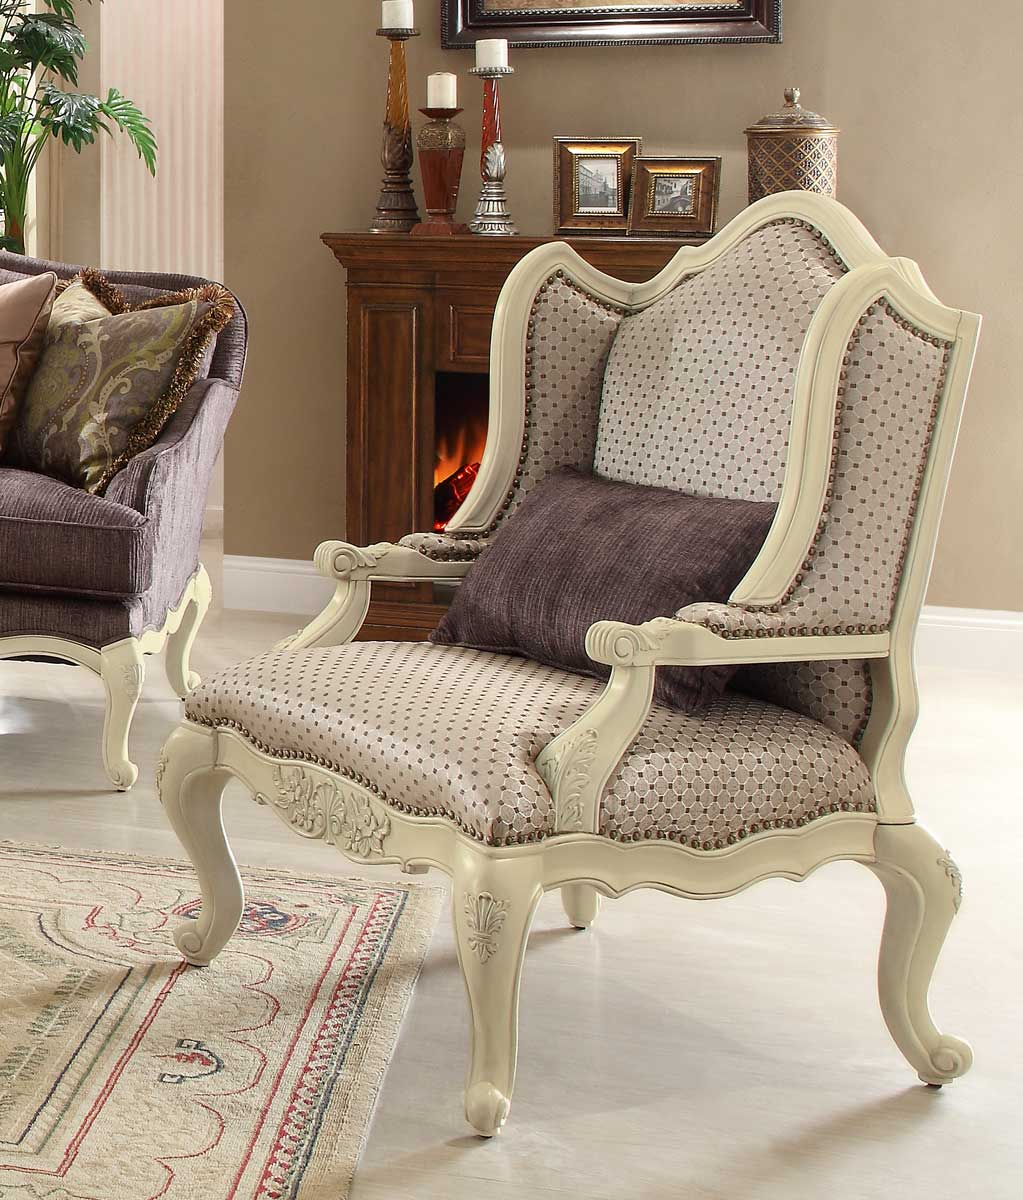 Homelegance Casanova II Accent chair - Antique White